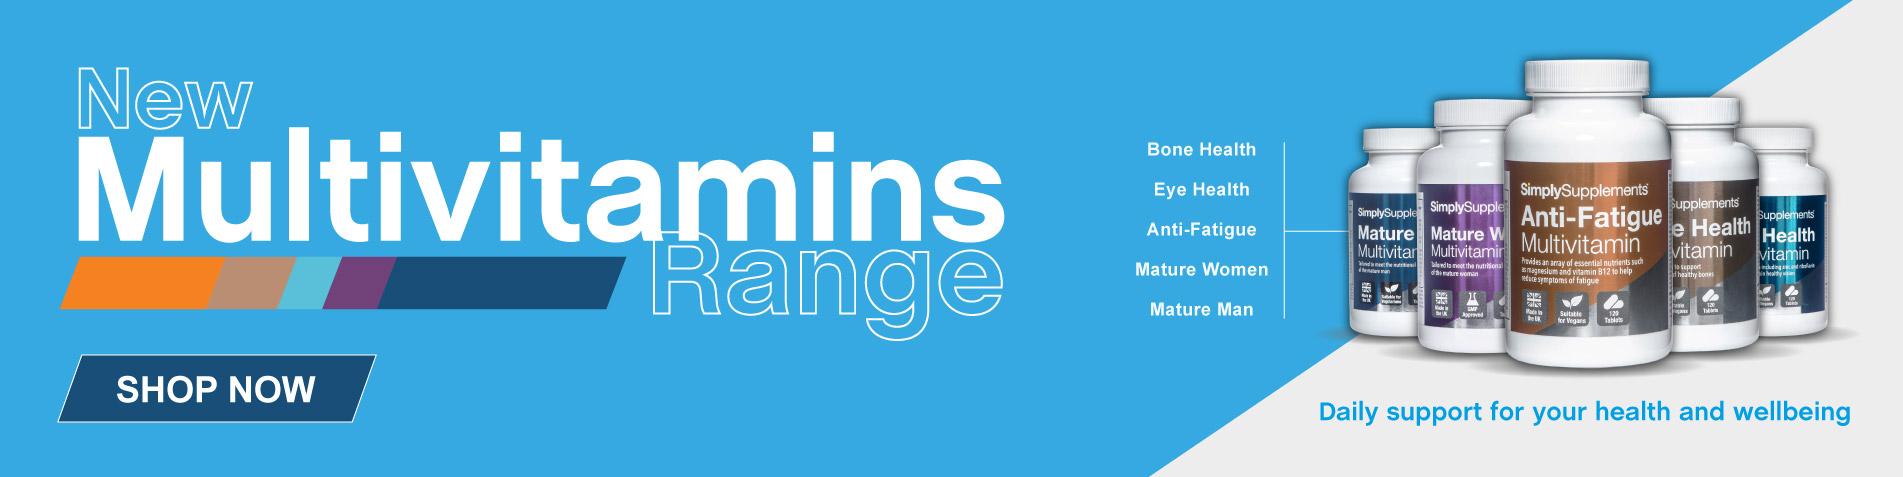 New Multivitamins Range